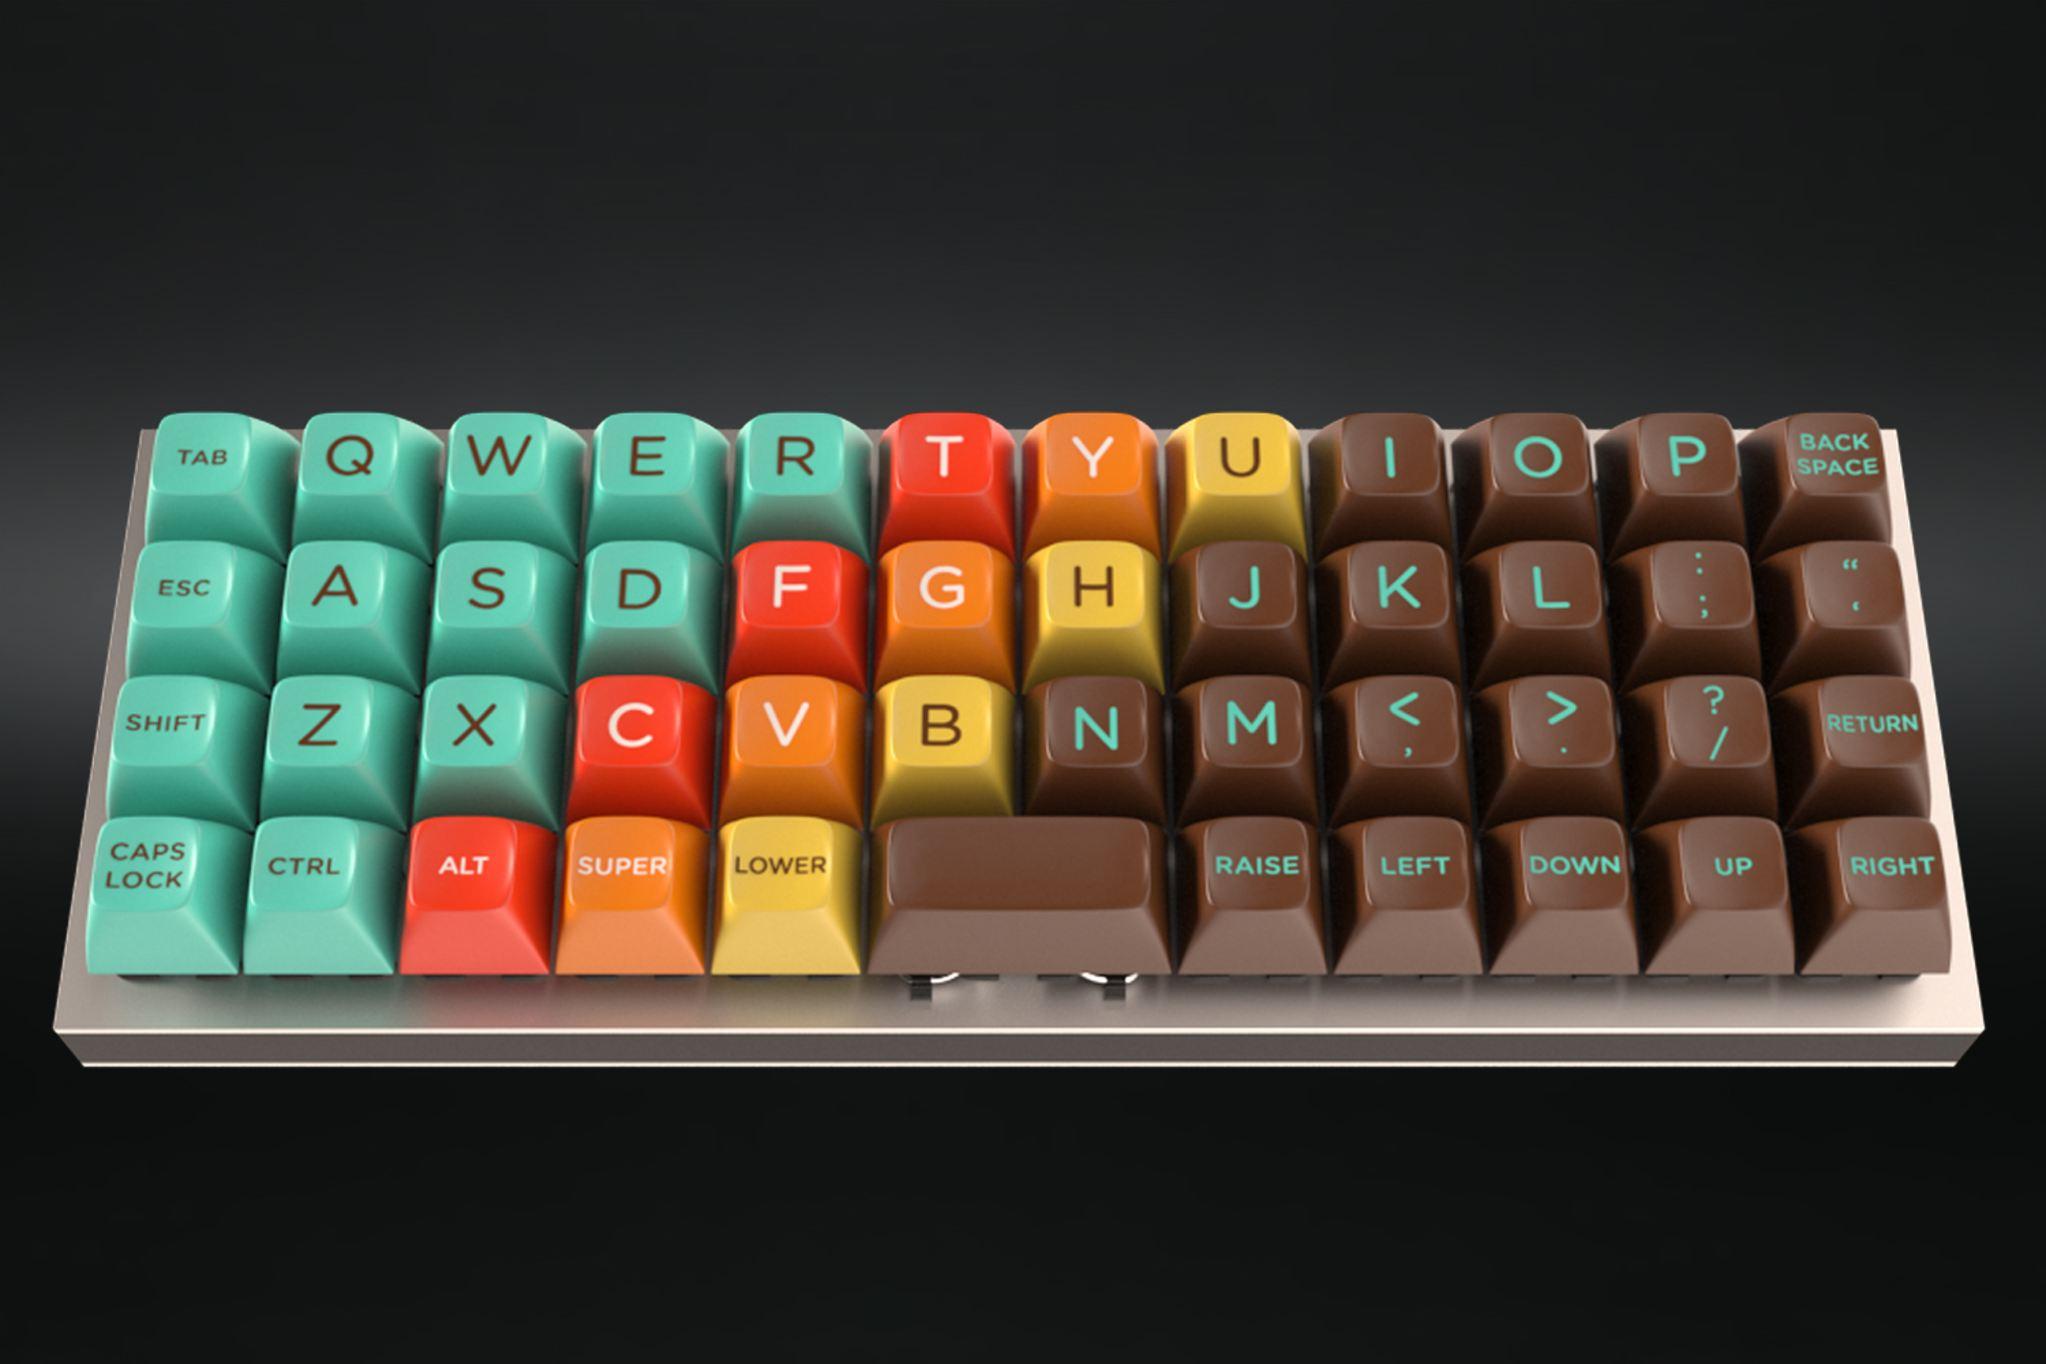 S Color Scheme Keyboard Buttons By Massdrop